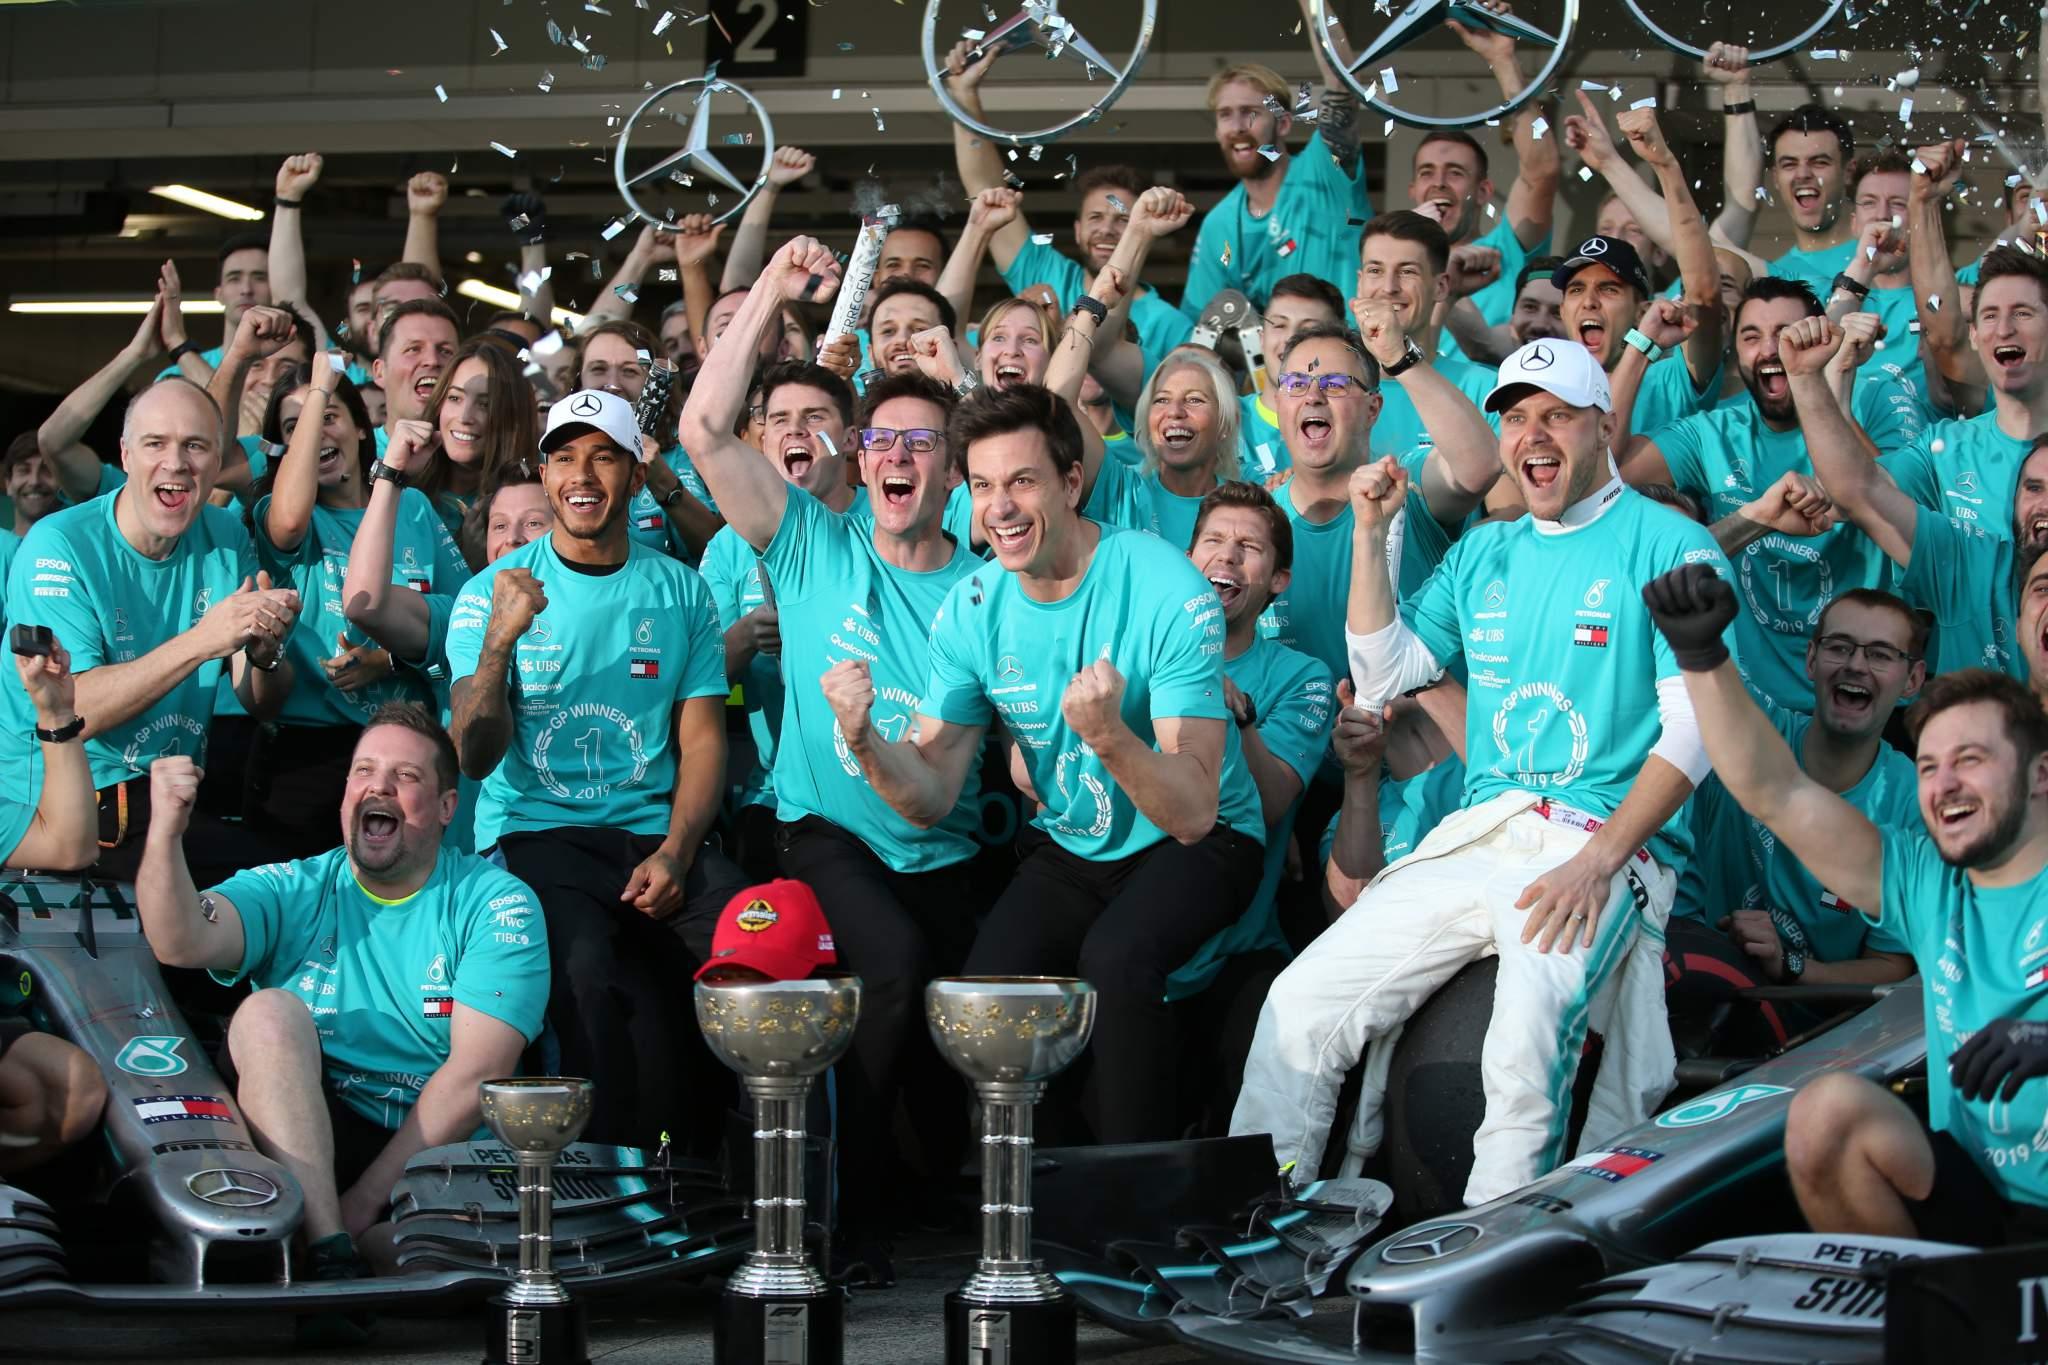 Mercedes wins 2019 F1 title